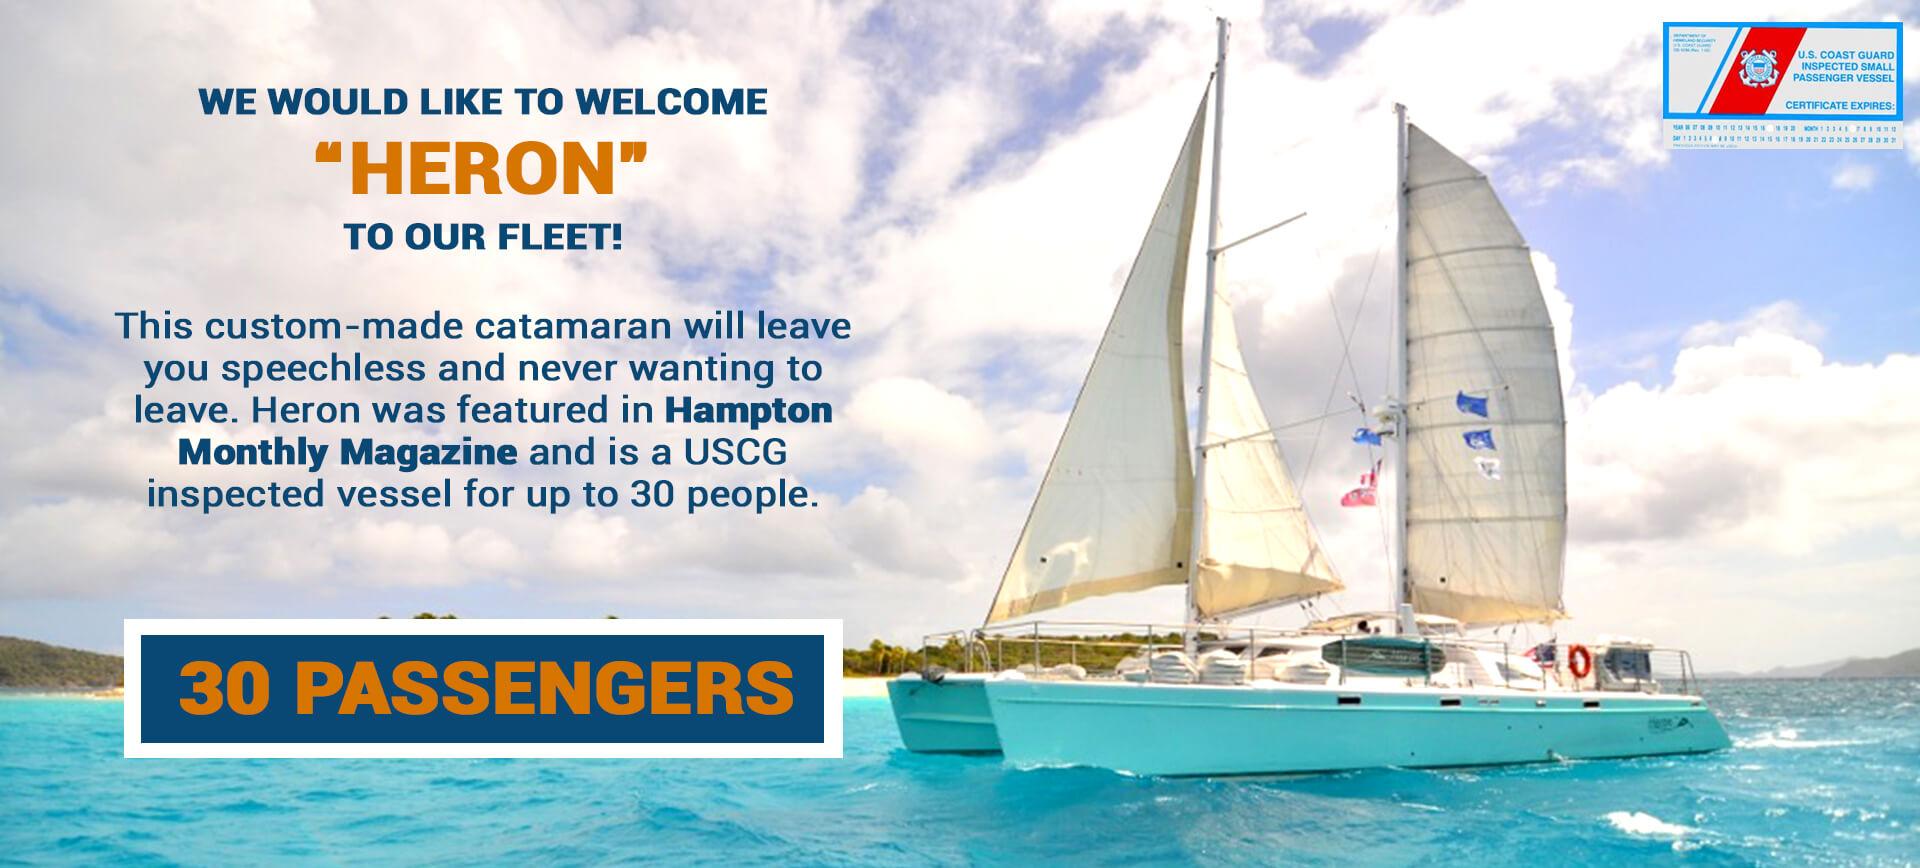 New sailing yacht heron can accommodate 30 passengers accommodates up to 30 passengers 1betcityfo Choice Image